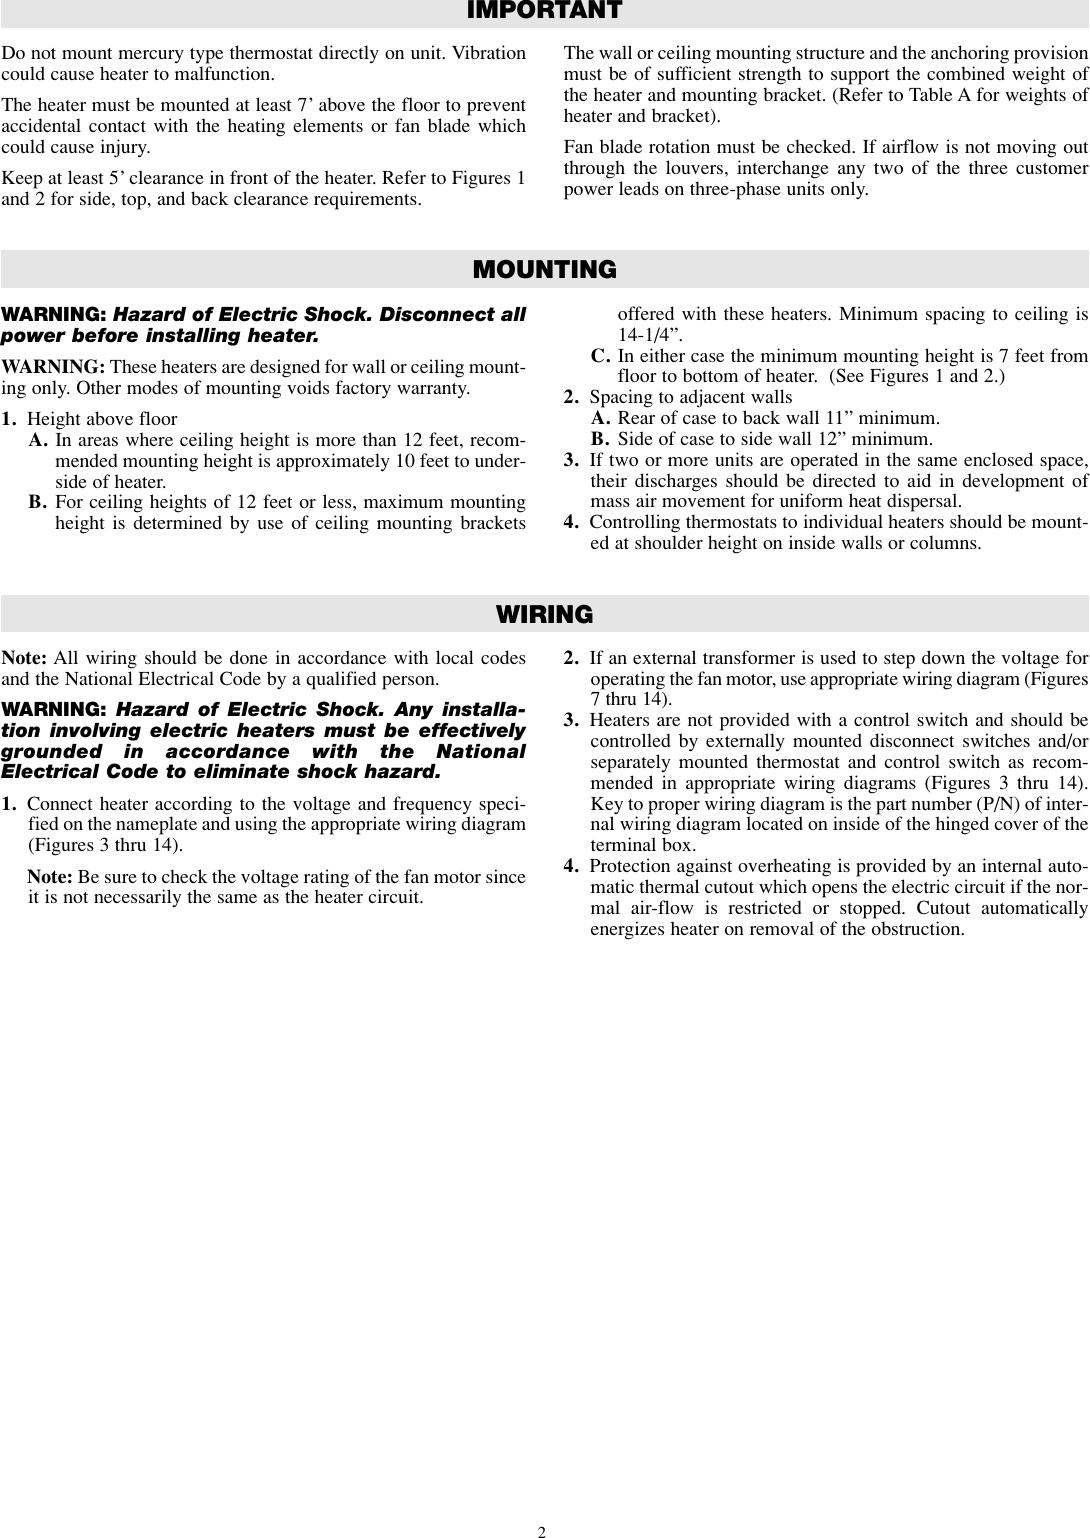 Chromalox Ub 3502a Users Manual Pf424 4 Chx Wiring Diagrams Page 2 Of 12